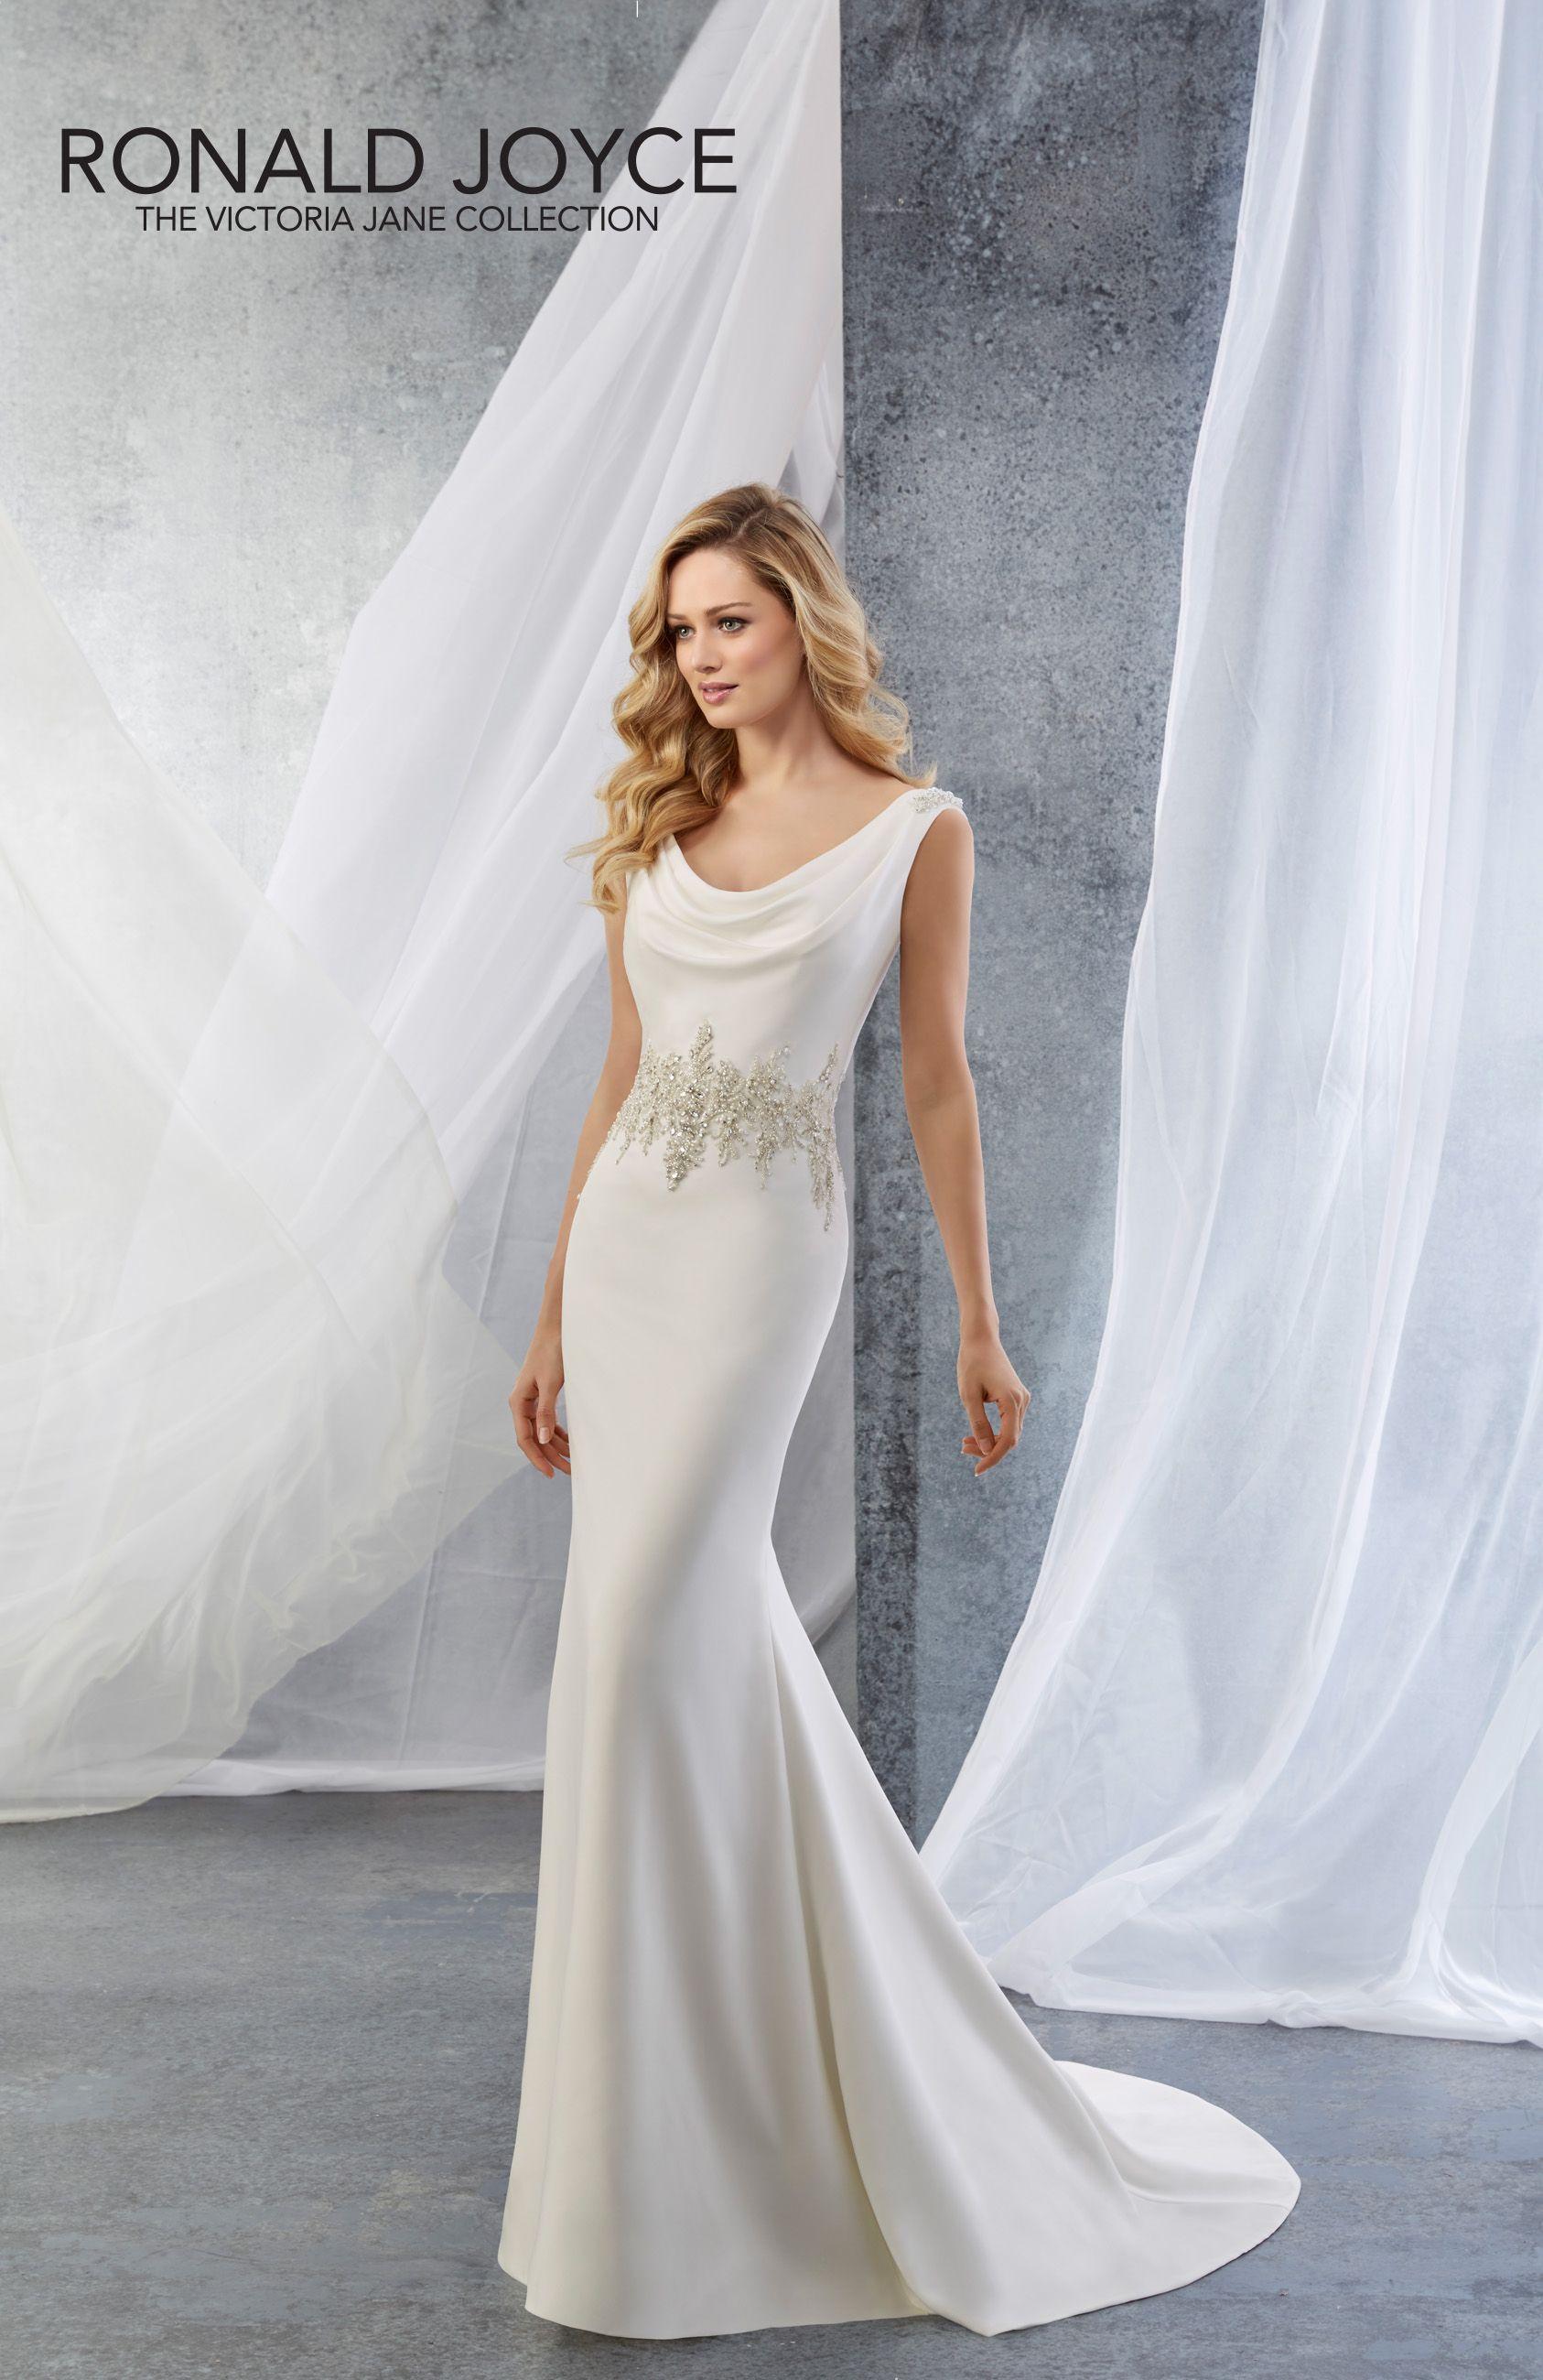 Pin by Pat Bittinger on Destination Wedding Dresses | Pinterest ...